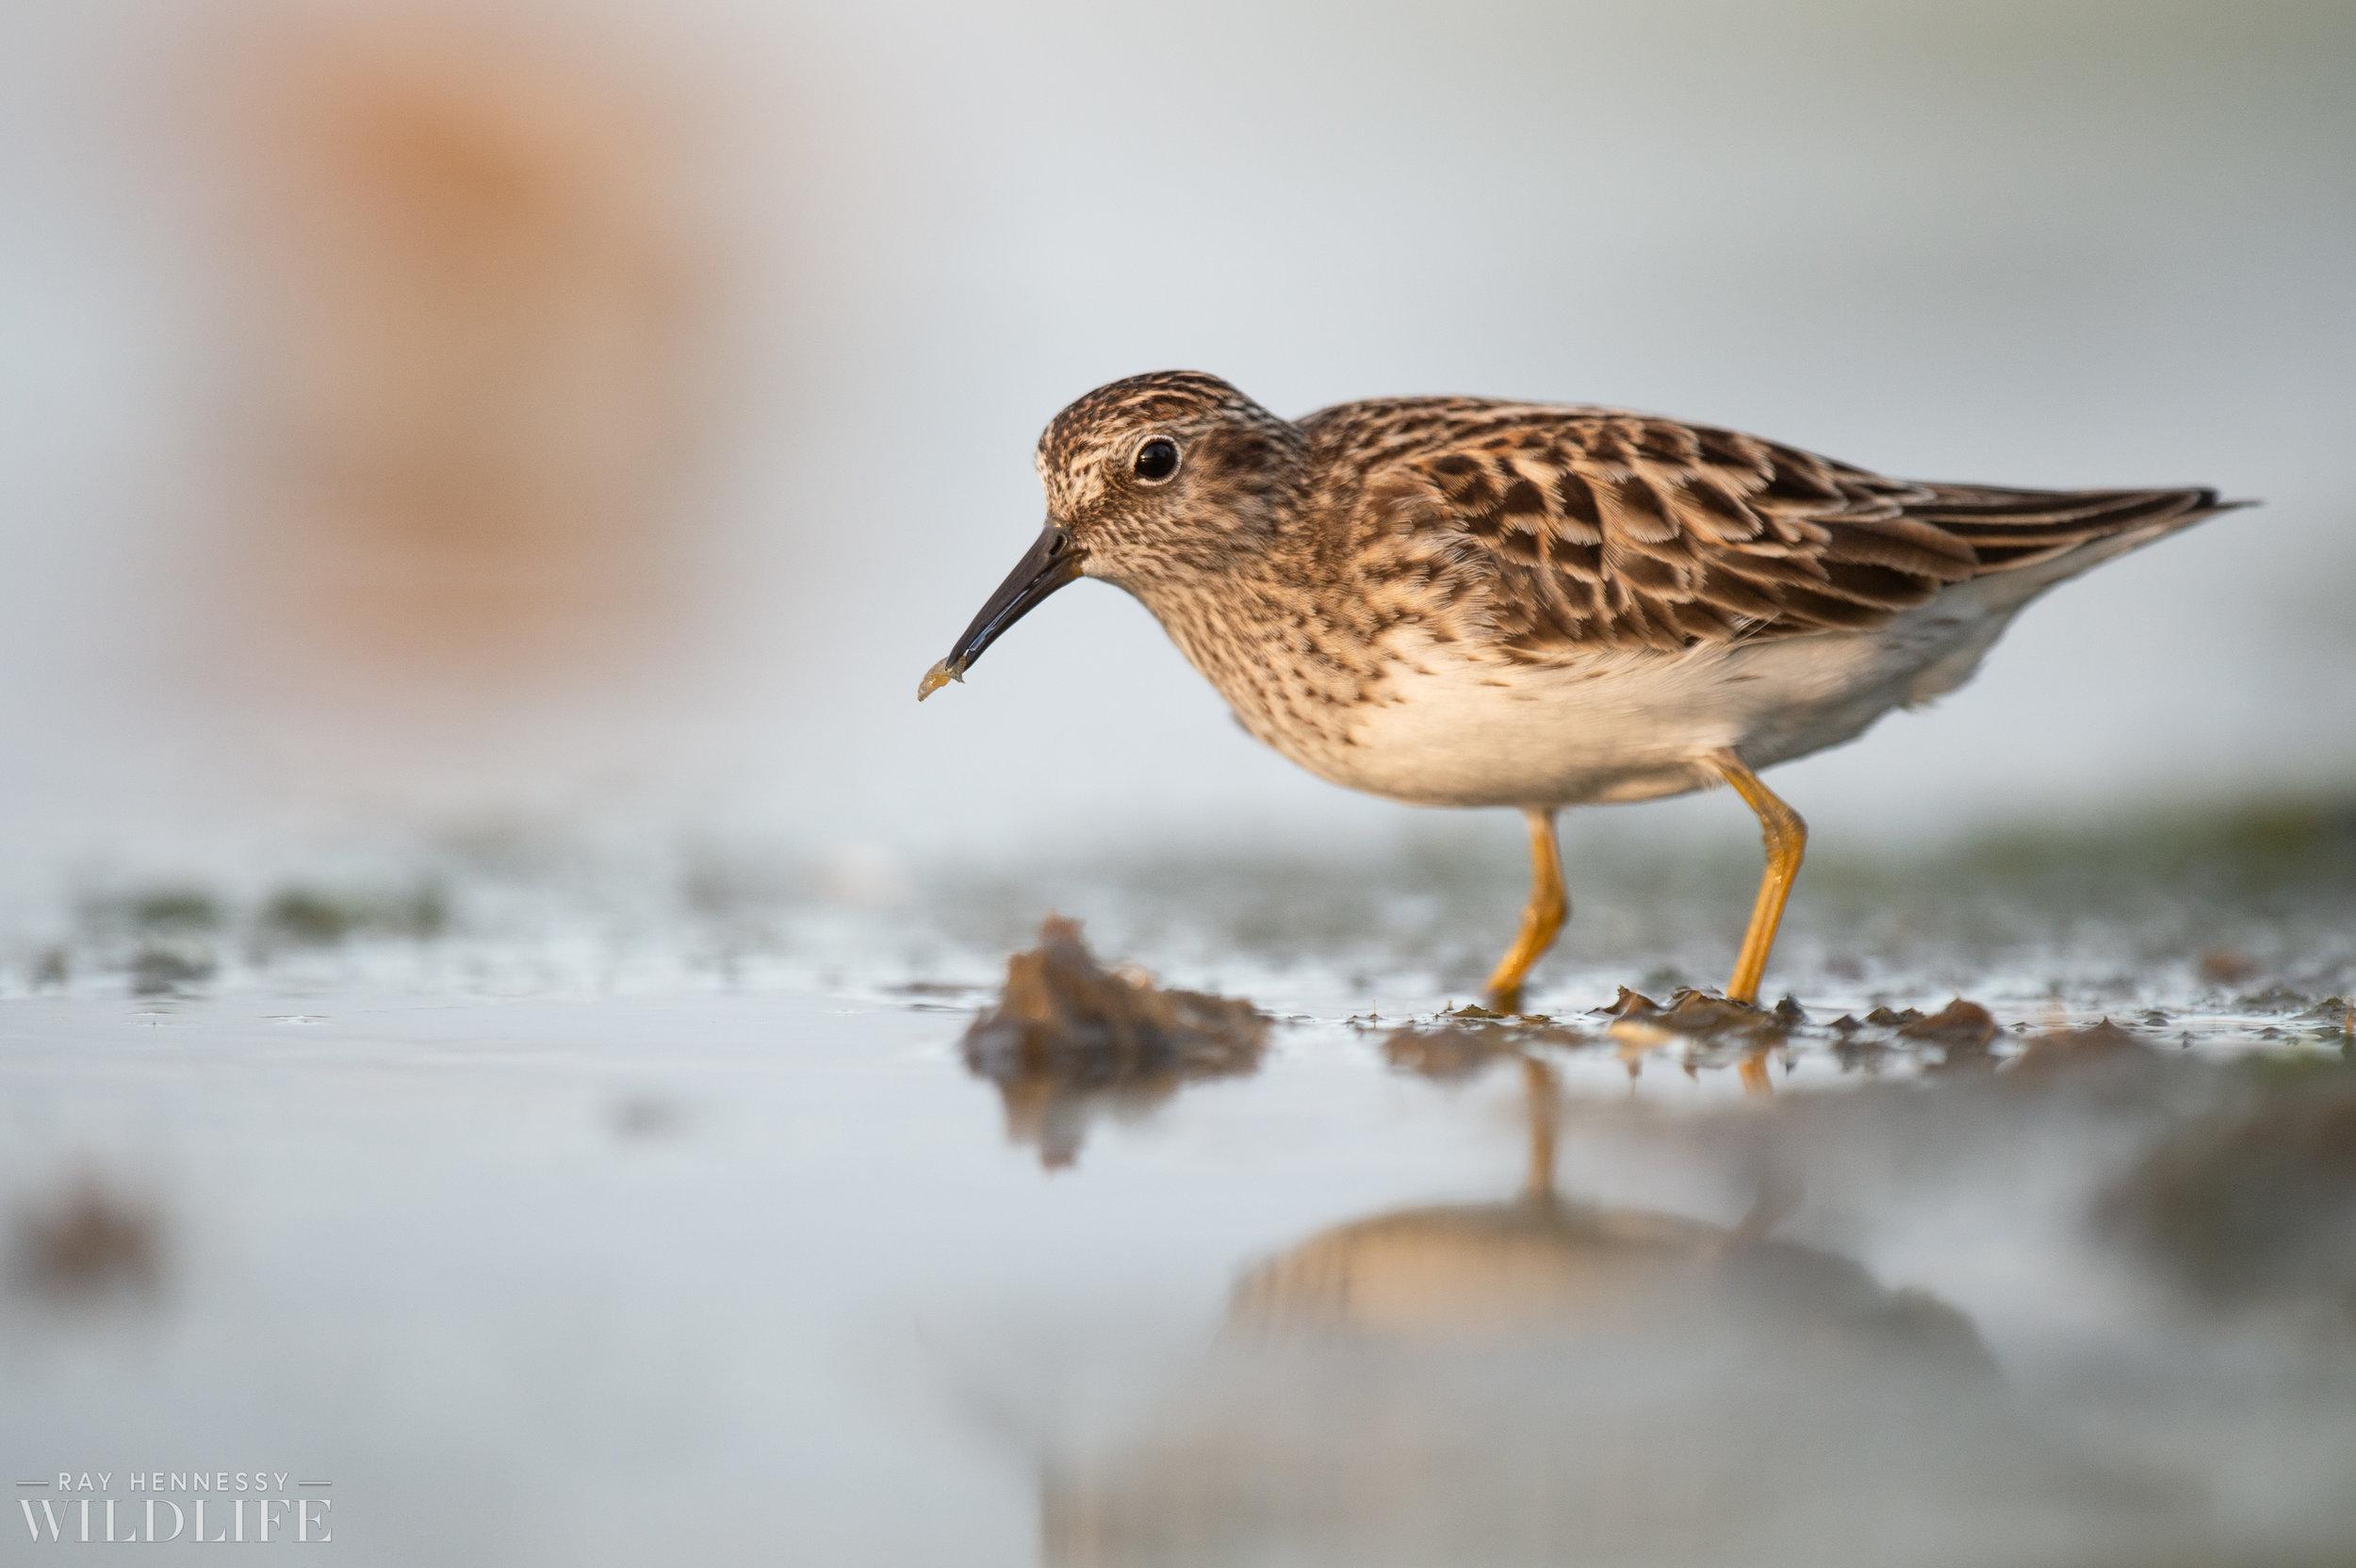 010_shorebirds-prothonotary-warbler.jpg